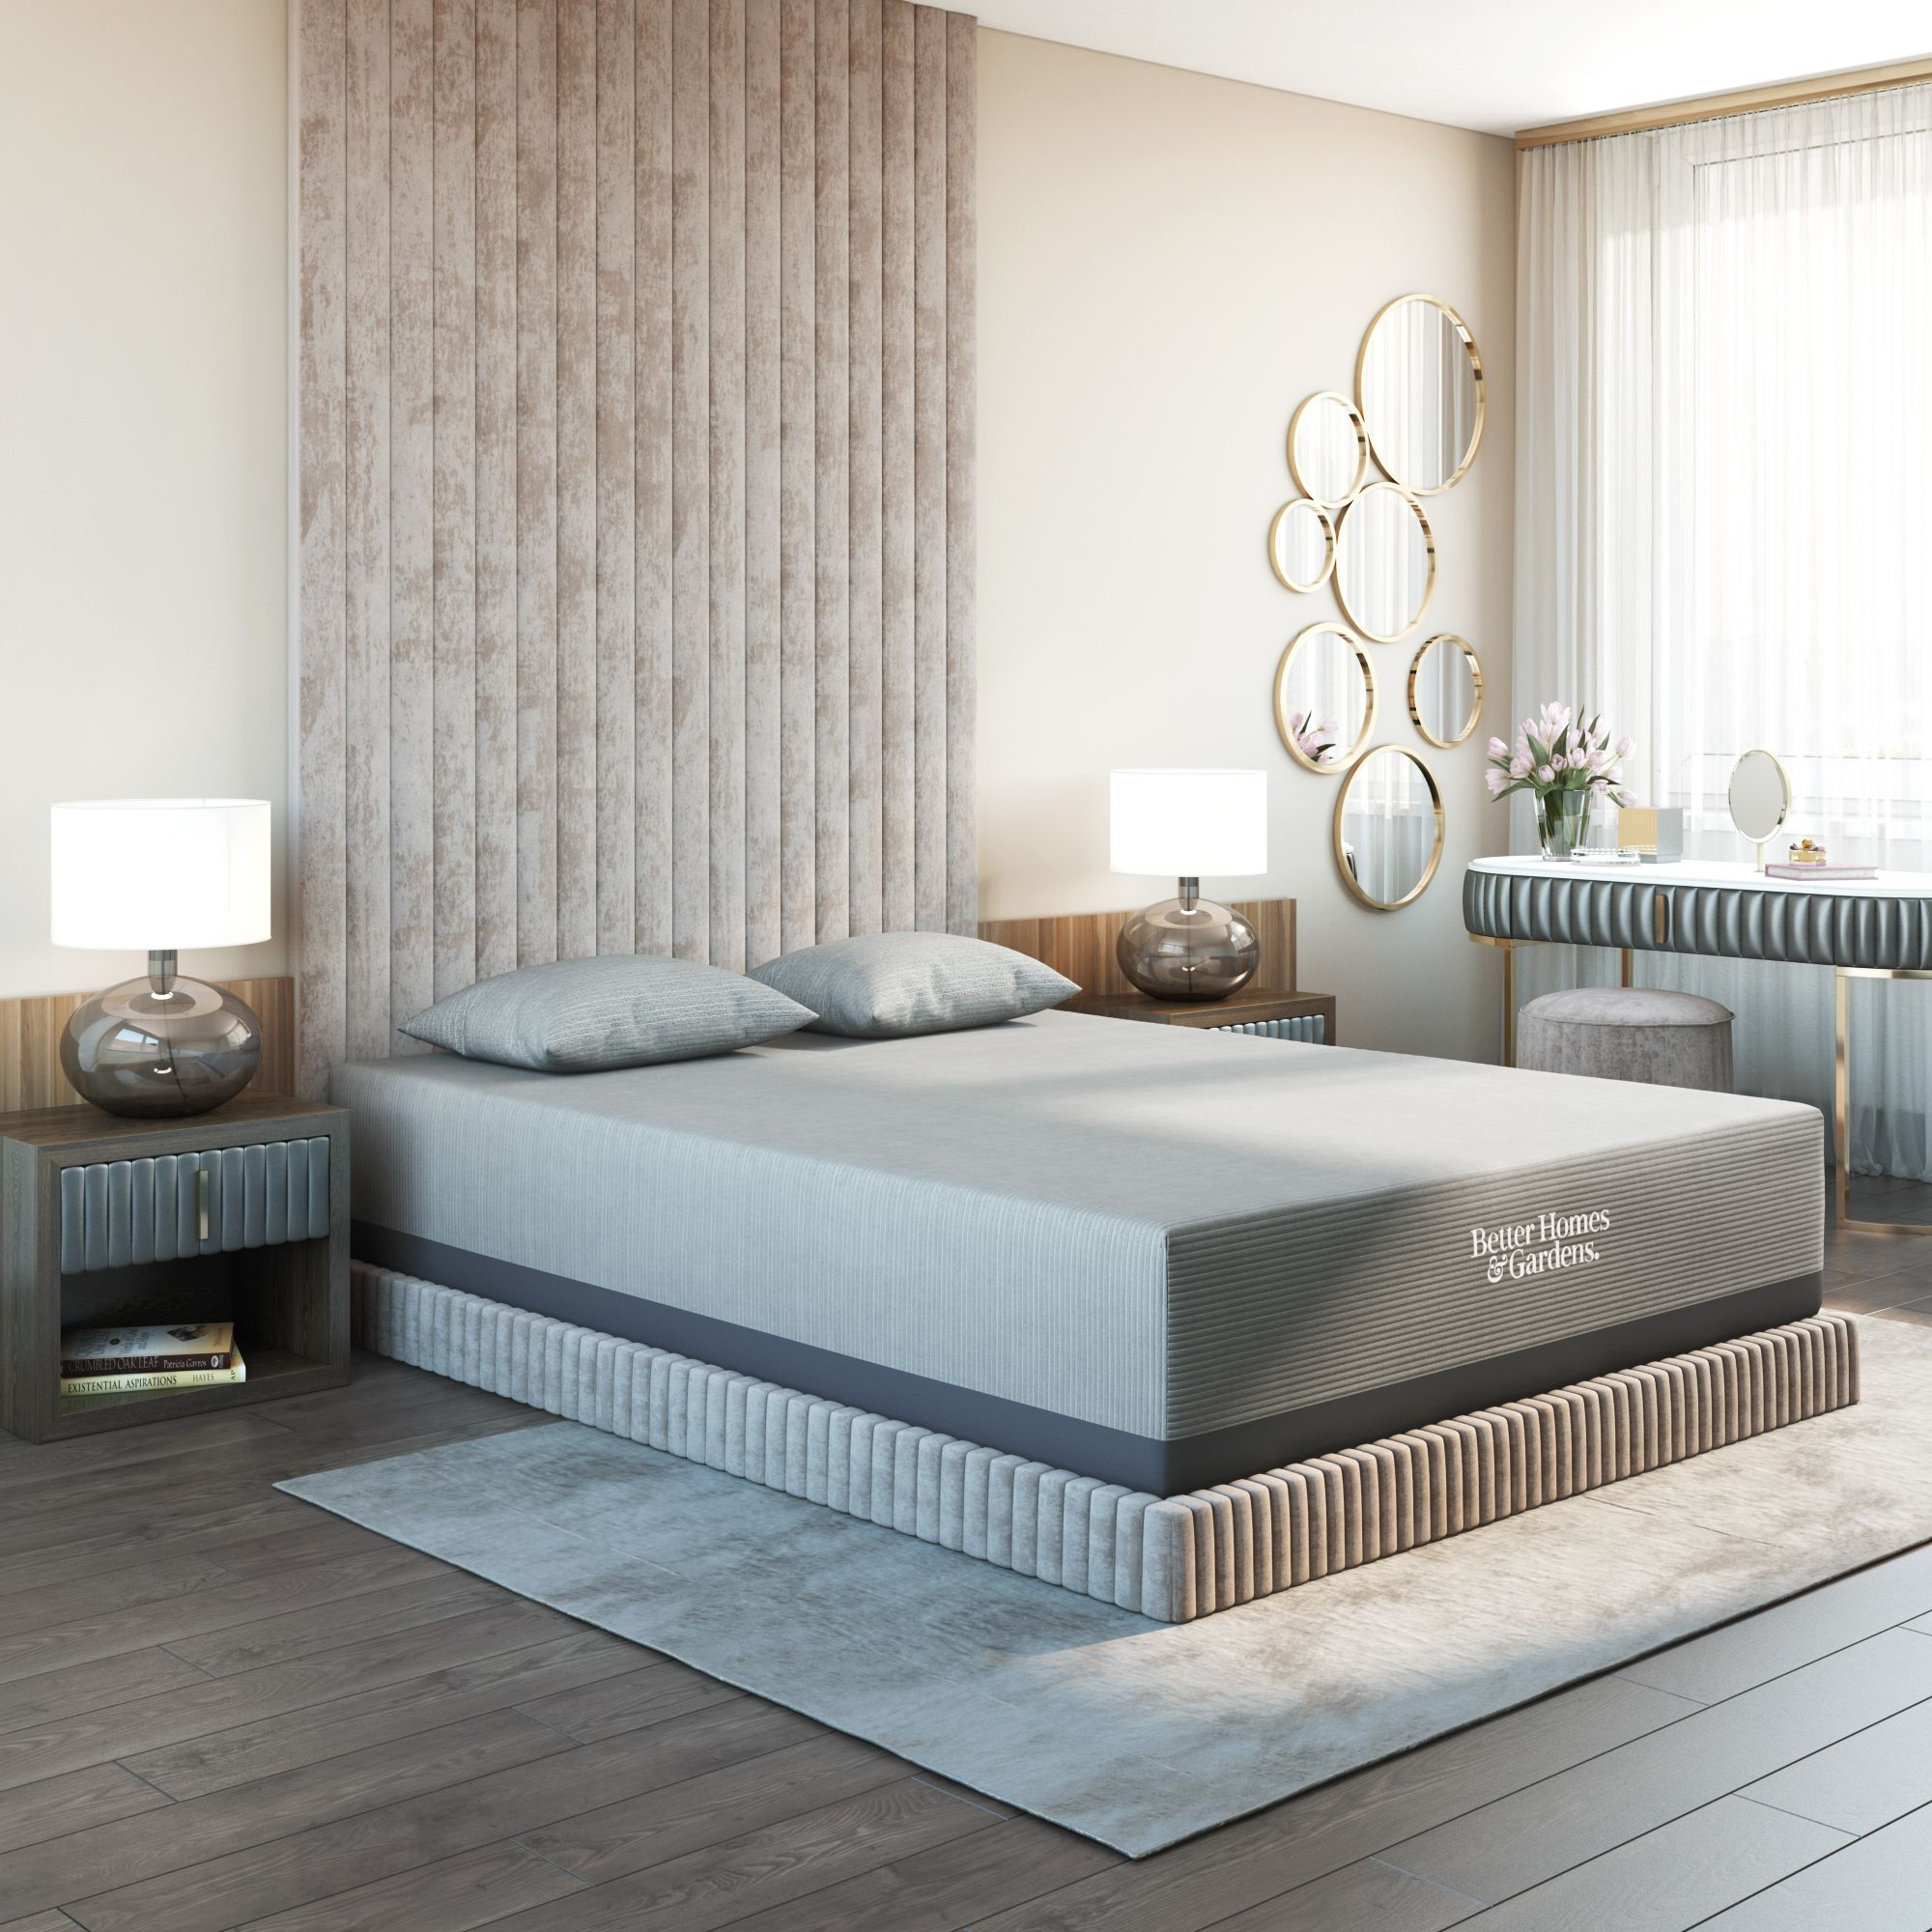 Home Memory foam mattress, Gel memory foam, Gel memory